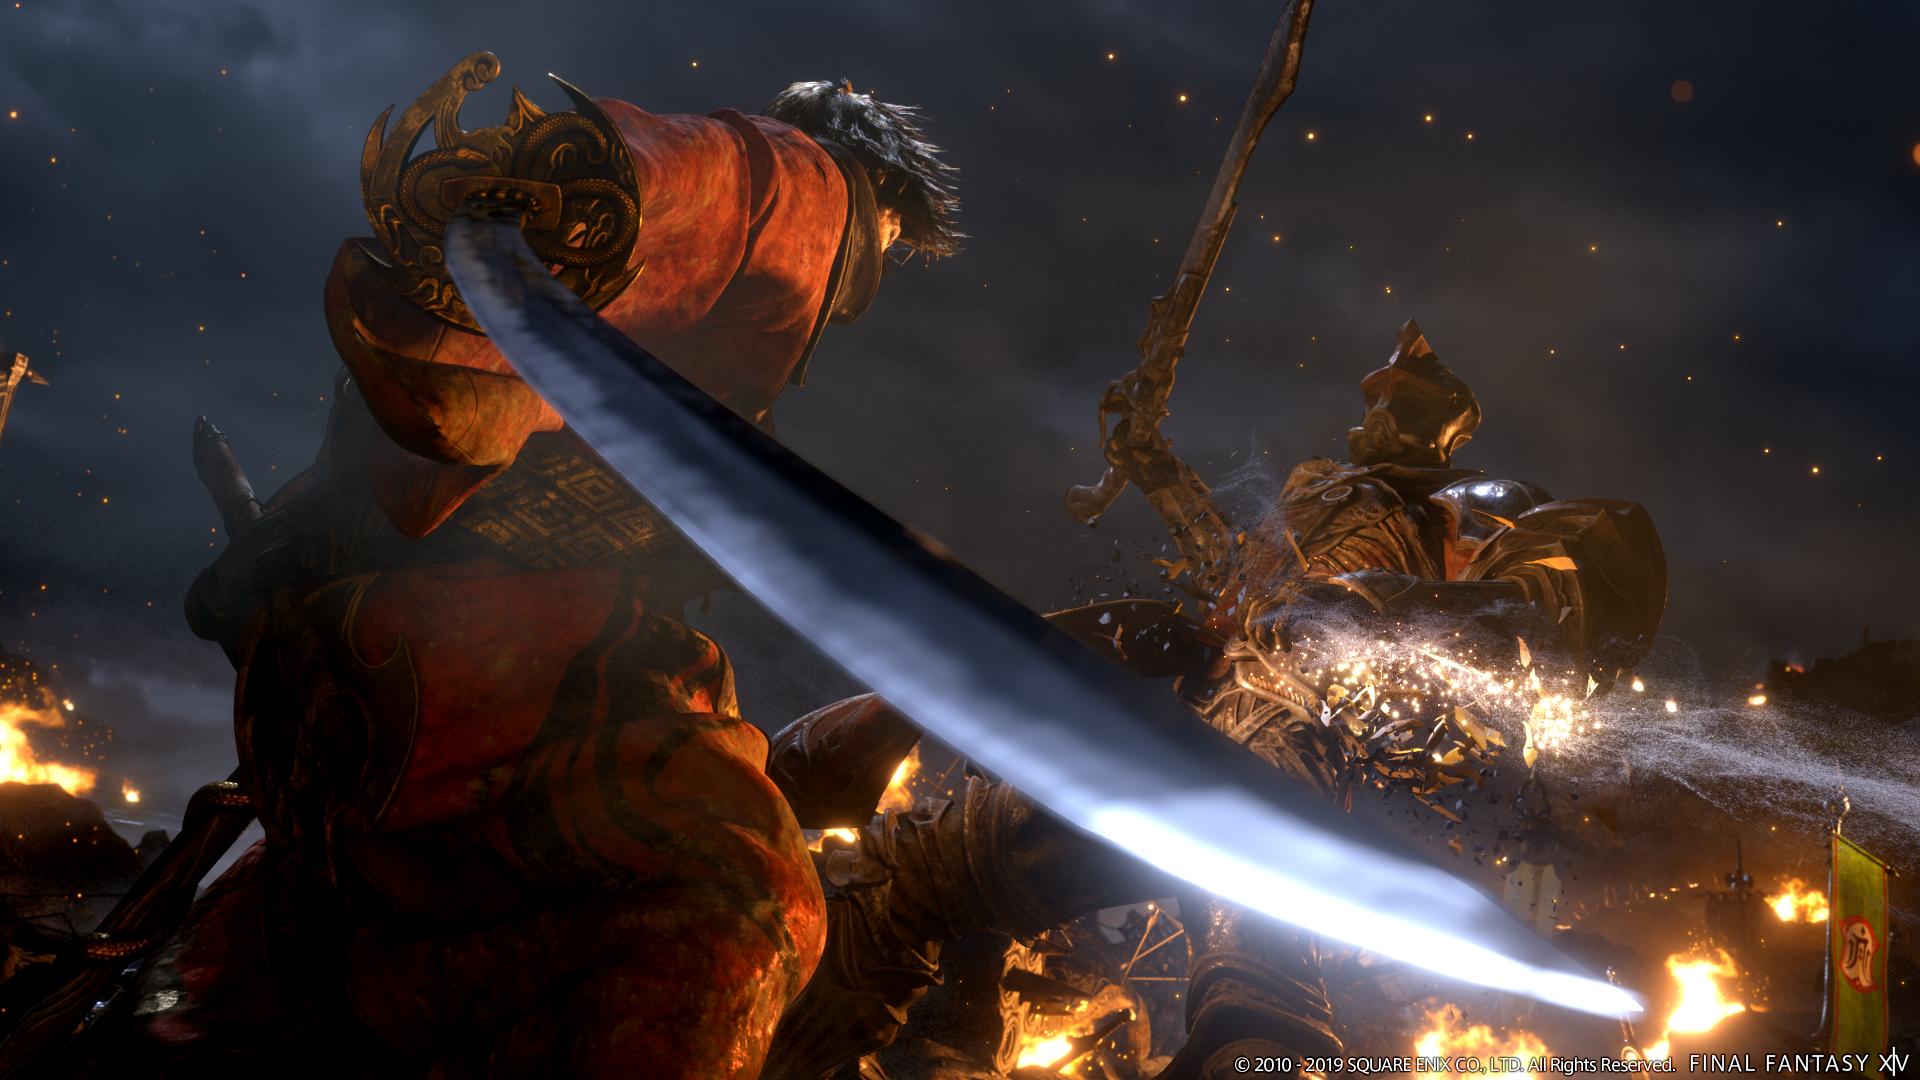 Final Fantasy XIV: Shadowbringers introduces Dancer class, Hrothgar